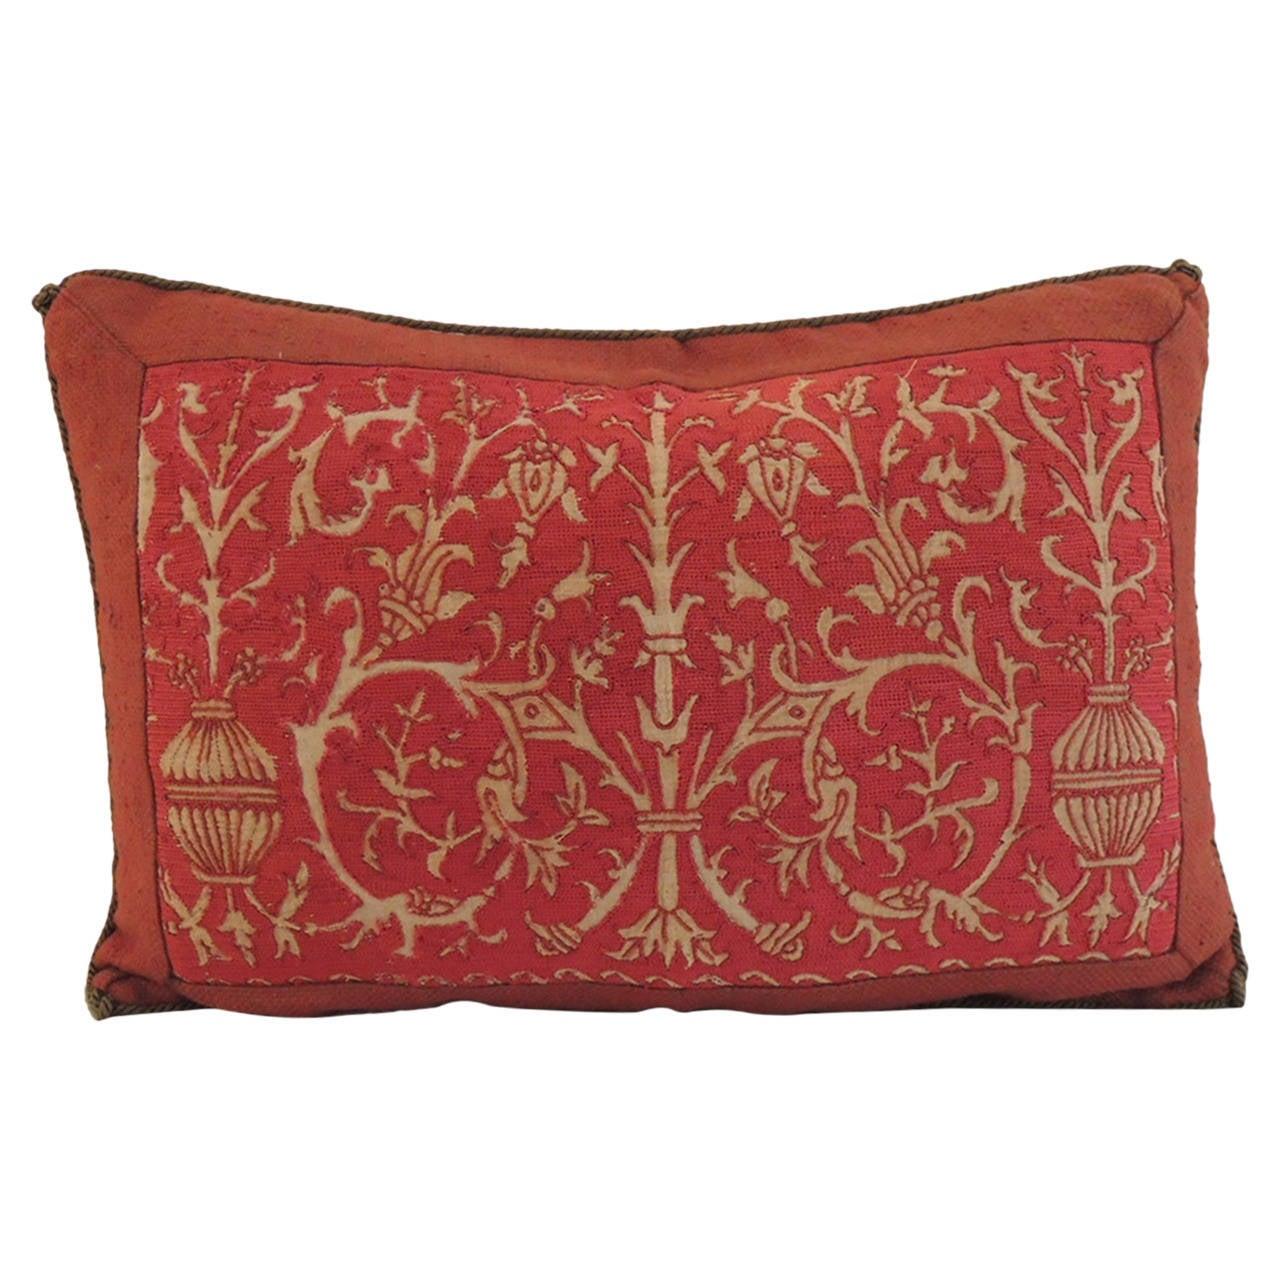 Turkish ottoman furniture - Red Linen Embroidery Lumbar Pillow At 1stdibs